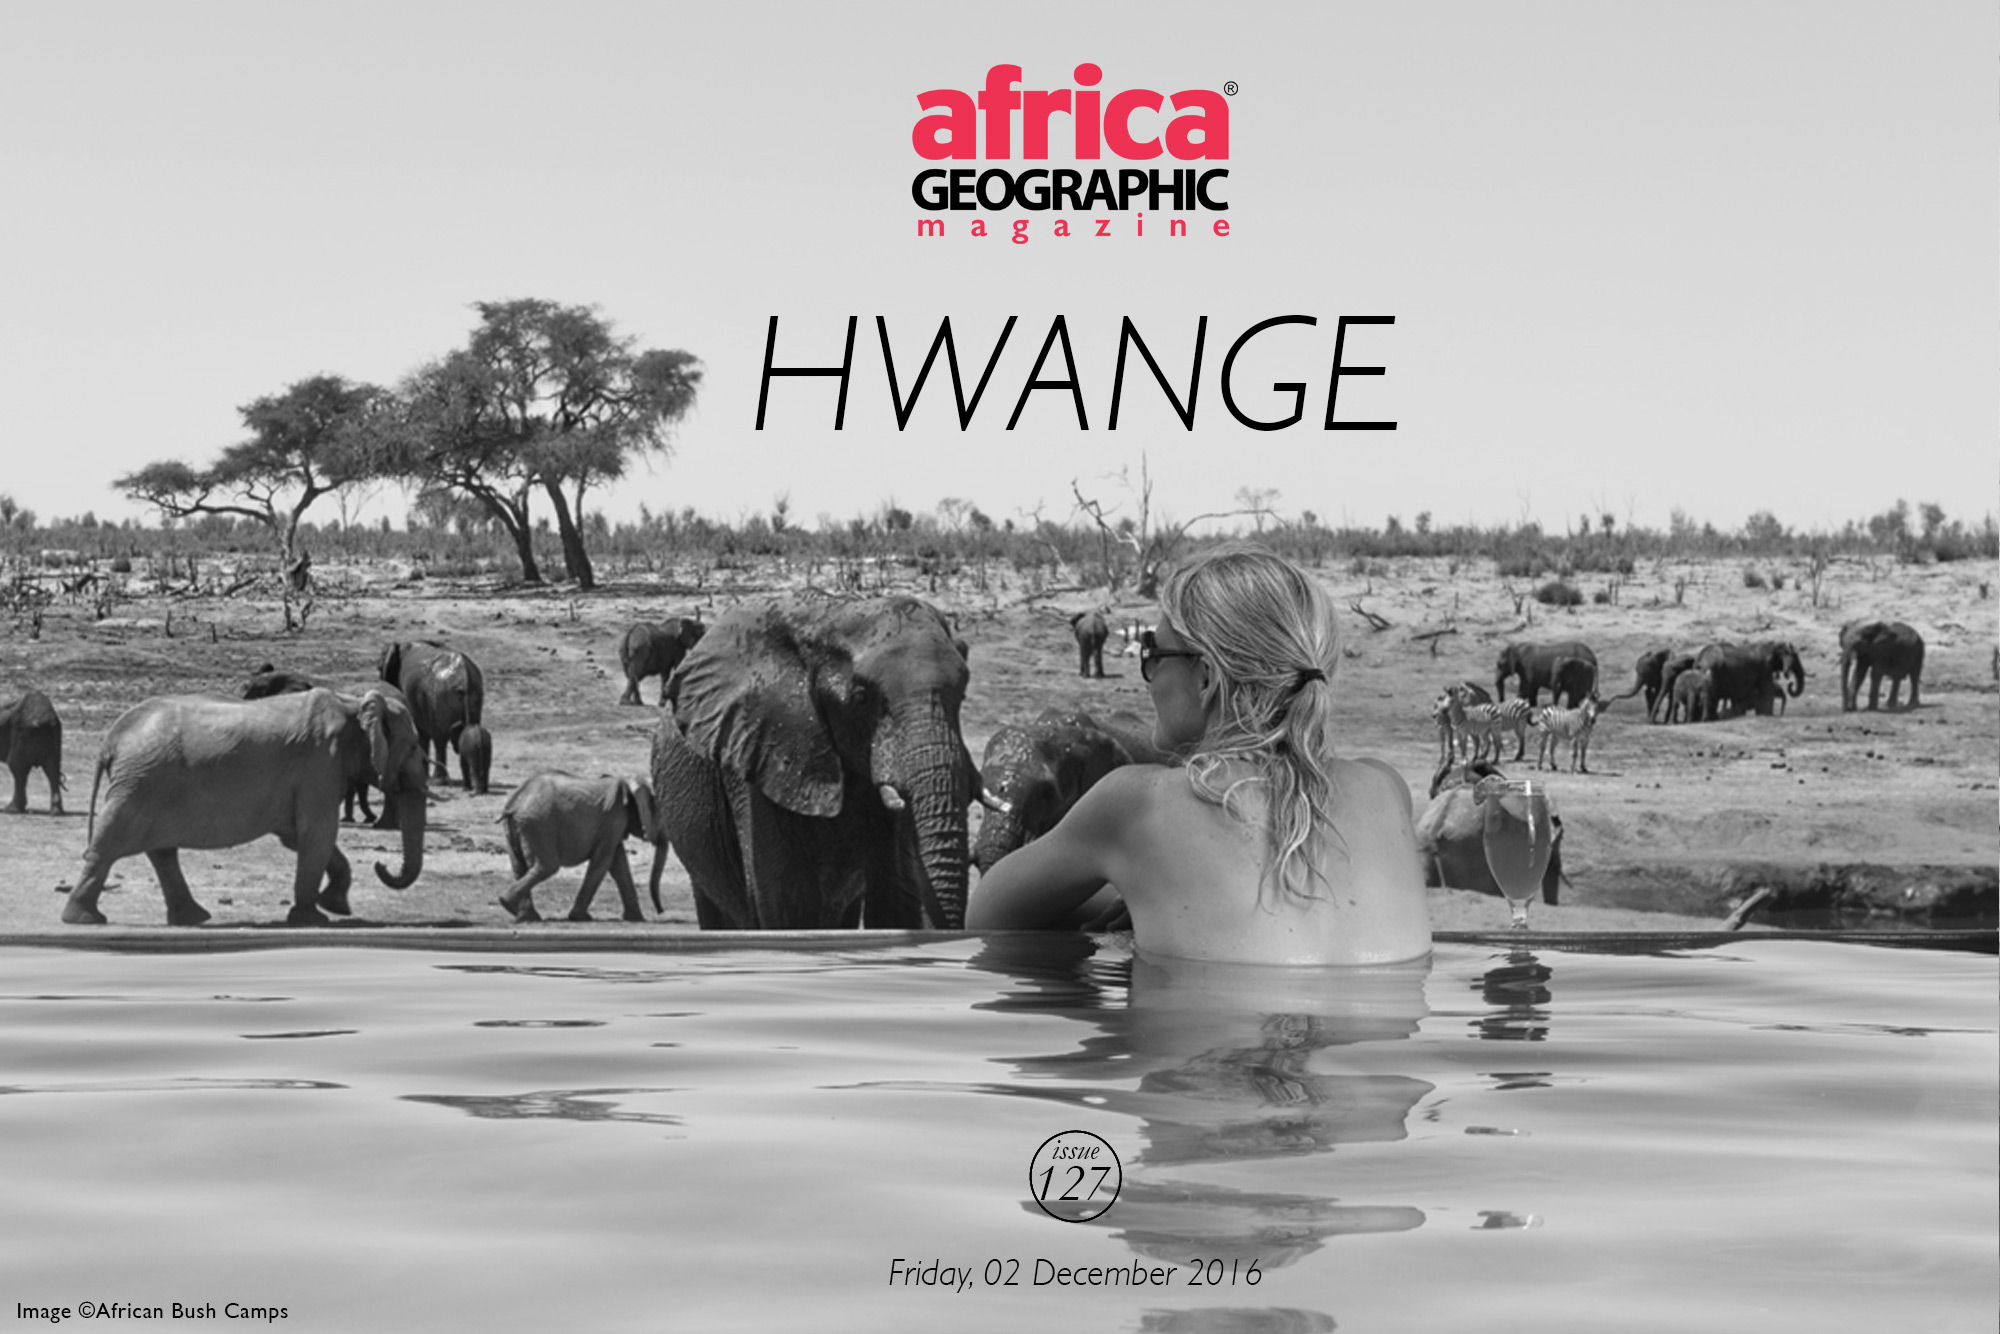 Hwange Africa Geographic Magazine